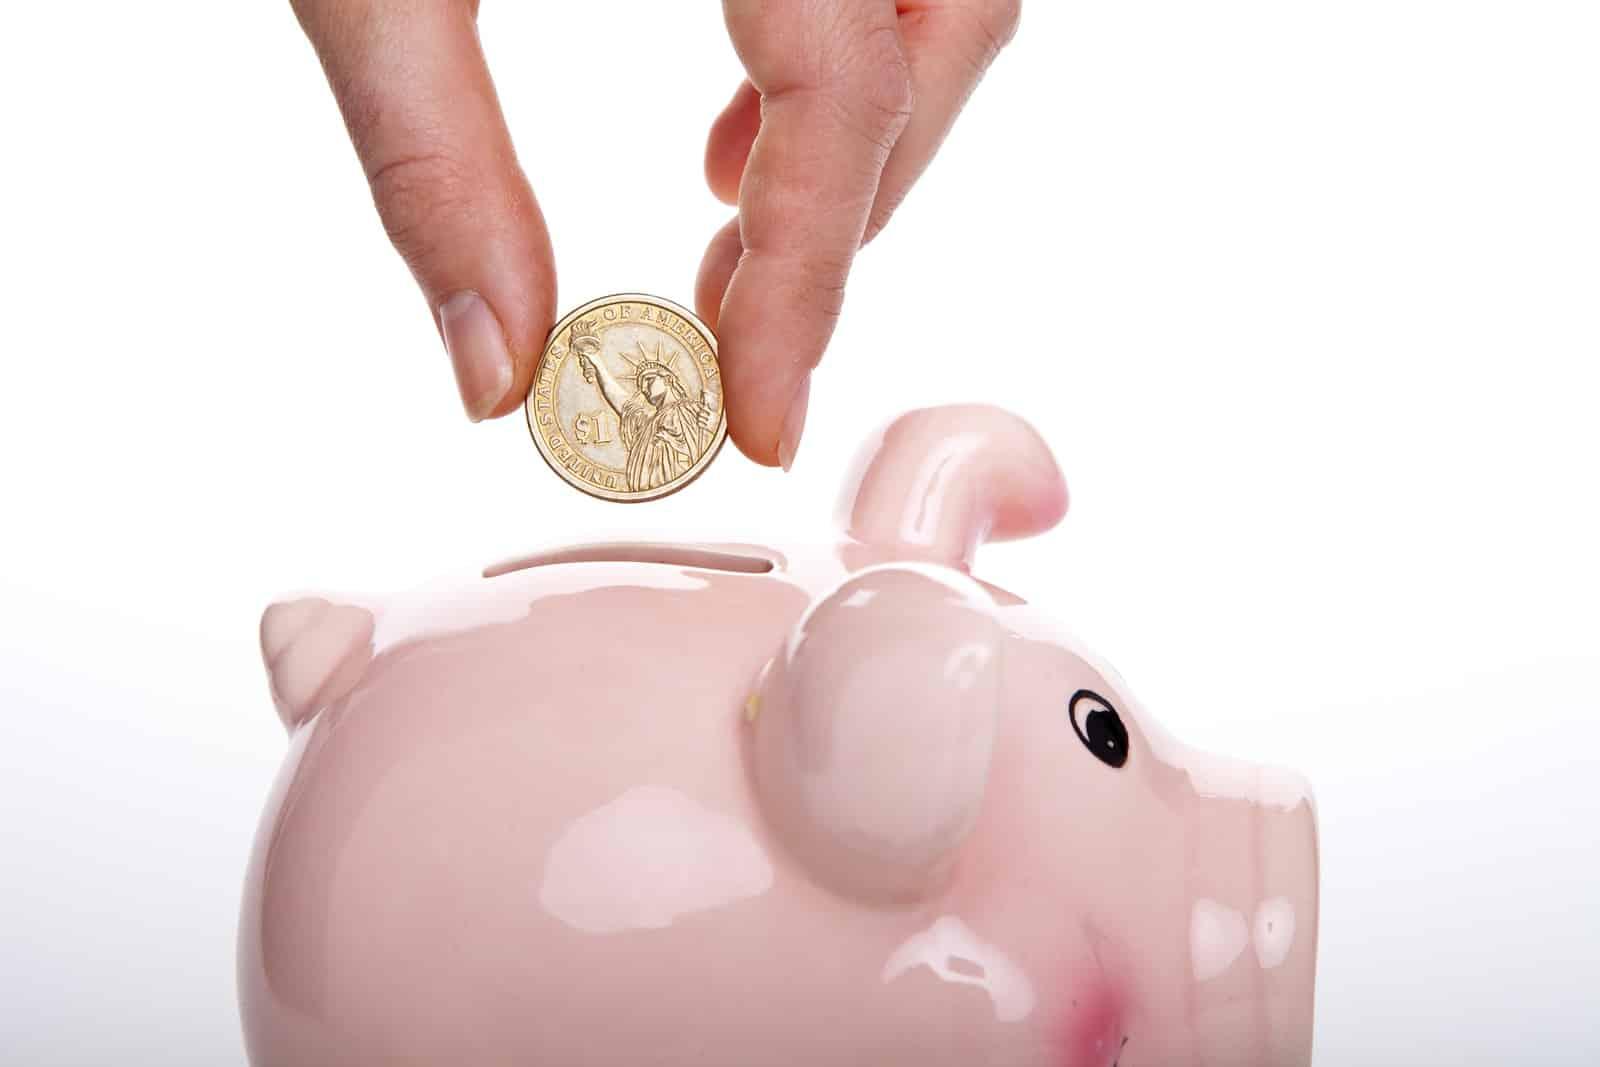 Read more about the article 機車有貸款可以增貸嗎?24小時小額借款,機車貸款是您最佳選擇!